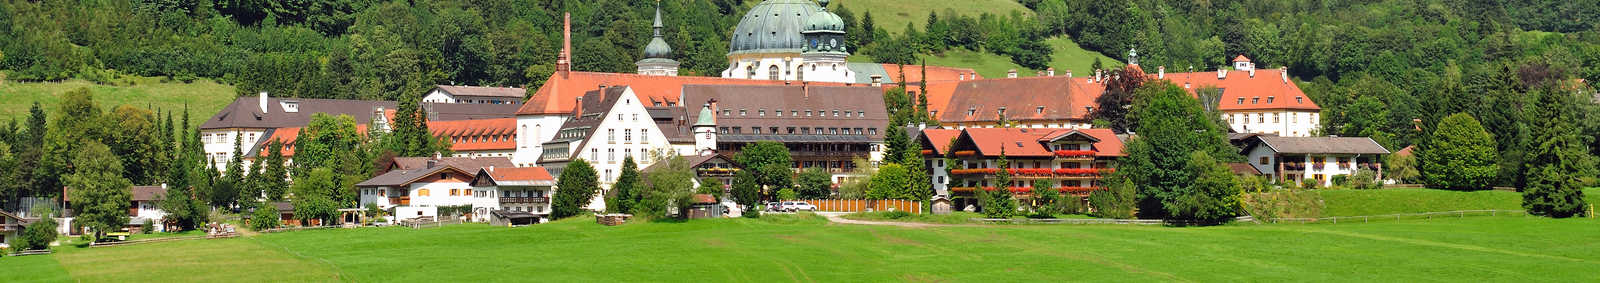 Ettal Monastery,Upper Bavaria,Germany